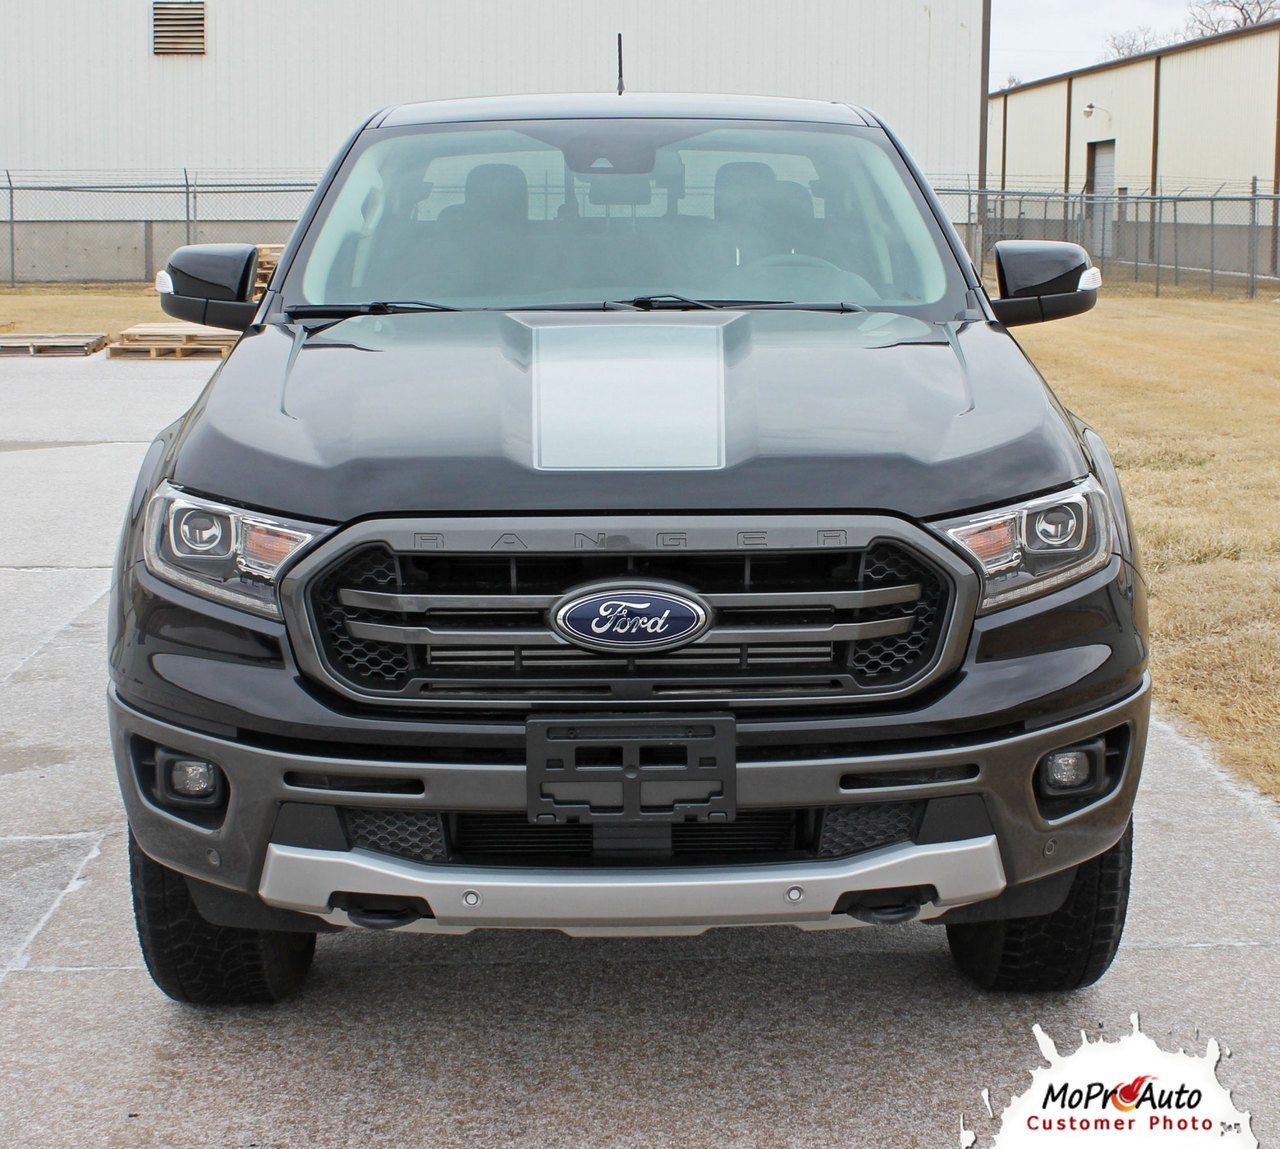 2019 2020 Ford  Ranger VIM HOOD Vinyl Graphics and Decals Kit - MoProAuto Pro Design Series